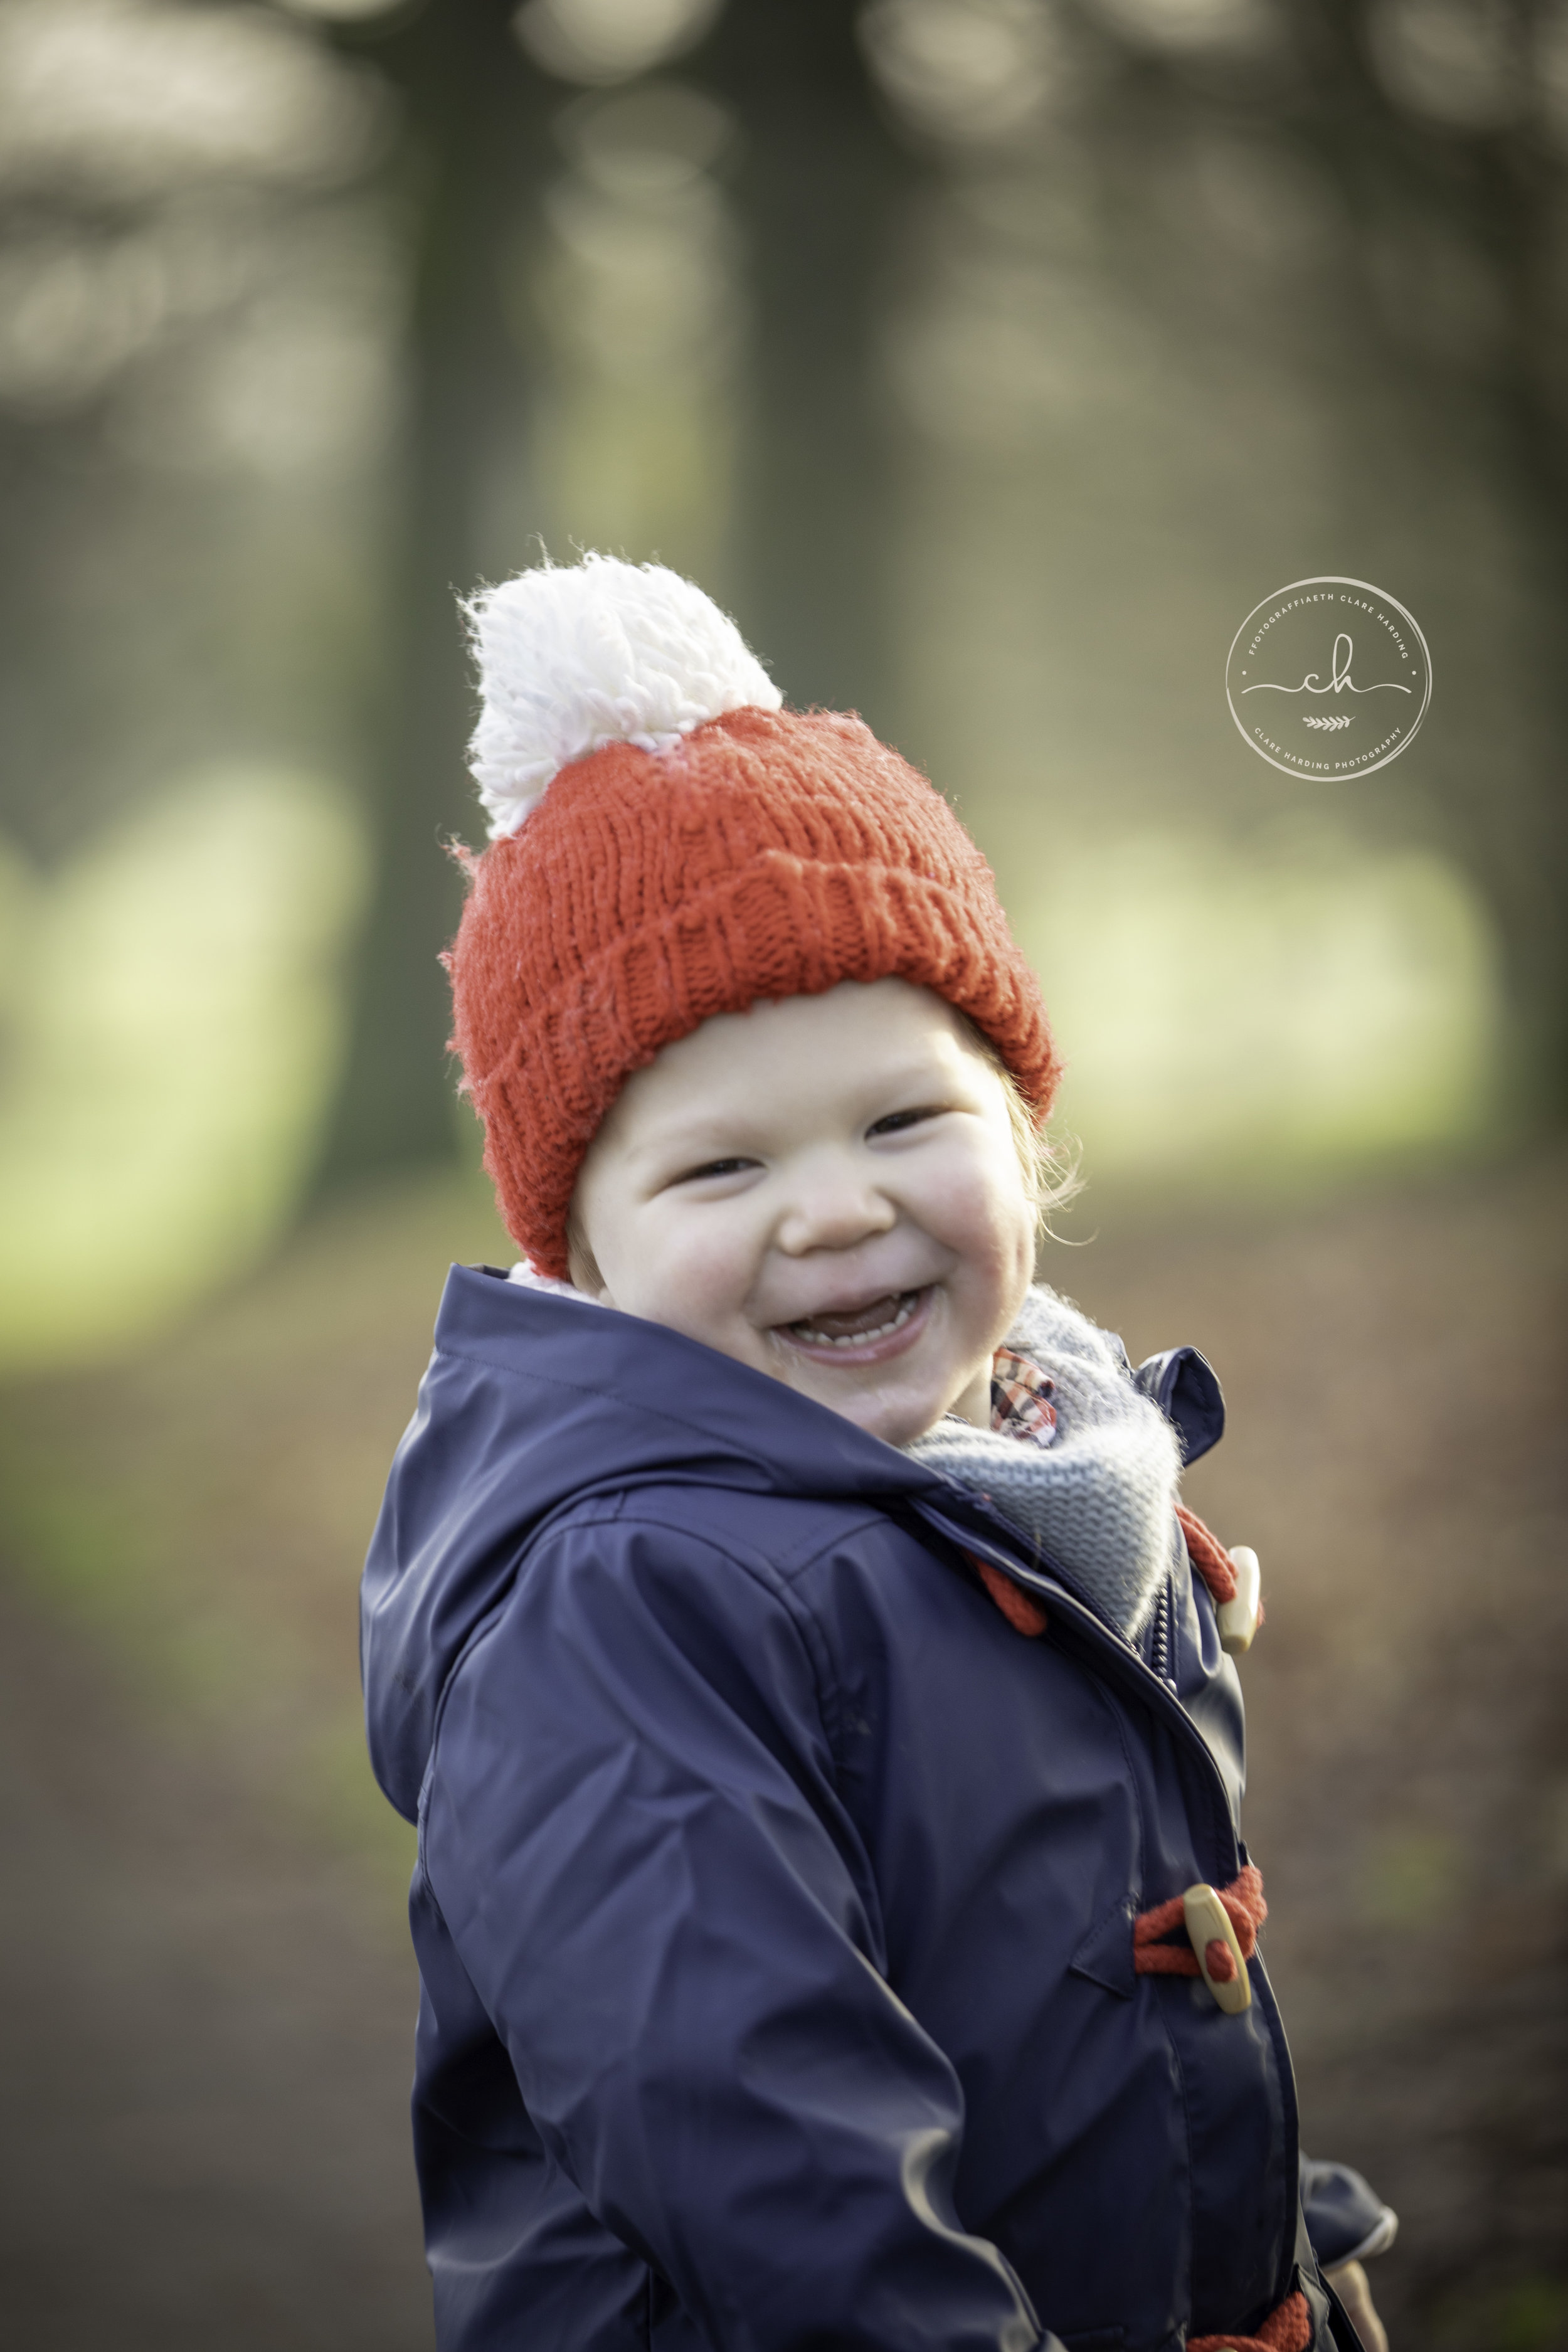 child-family-photographer-vale-of-glamorgan.jpg